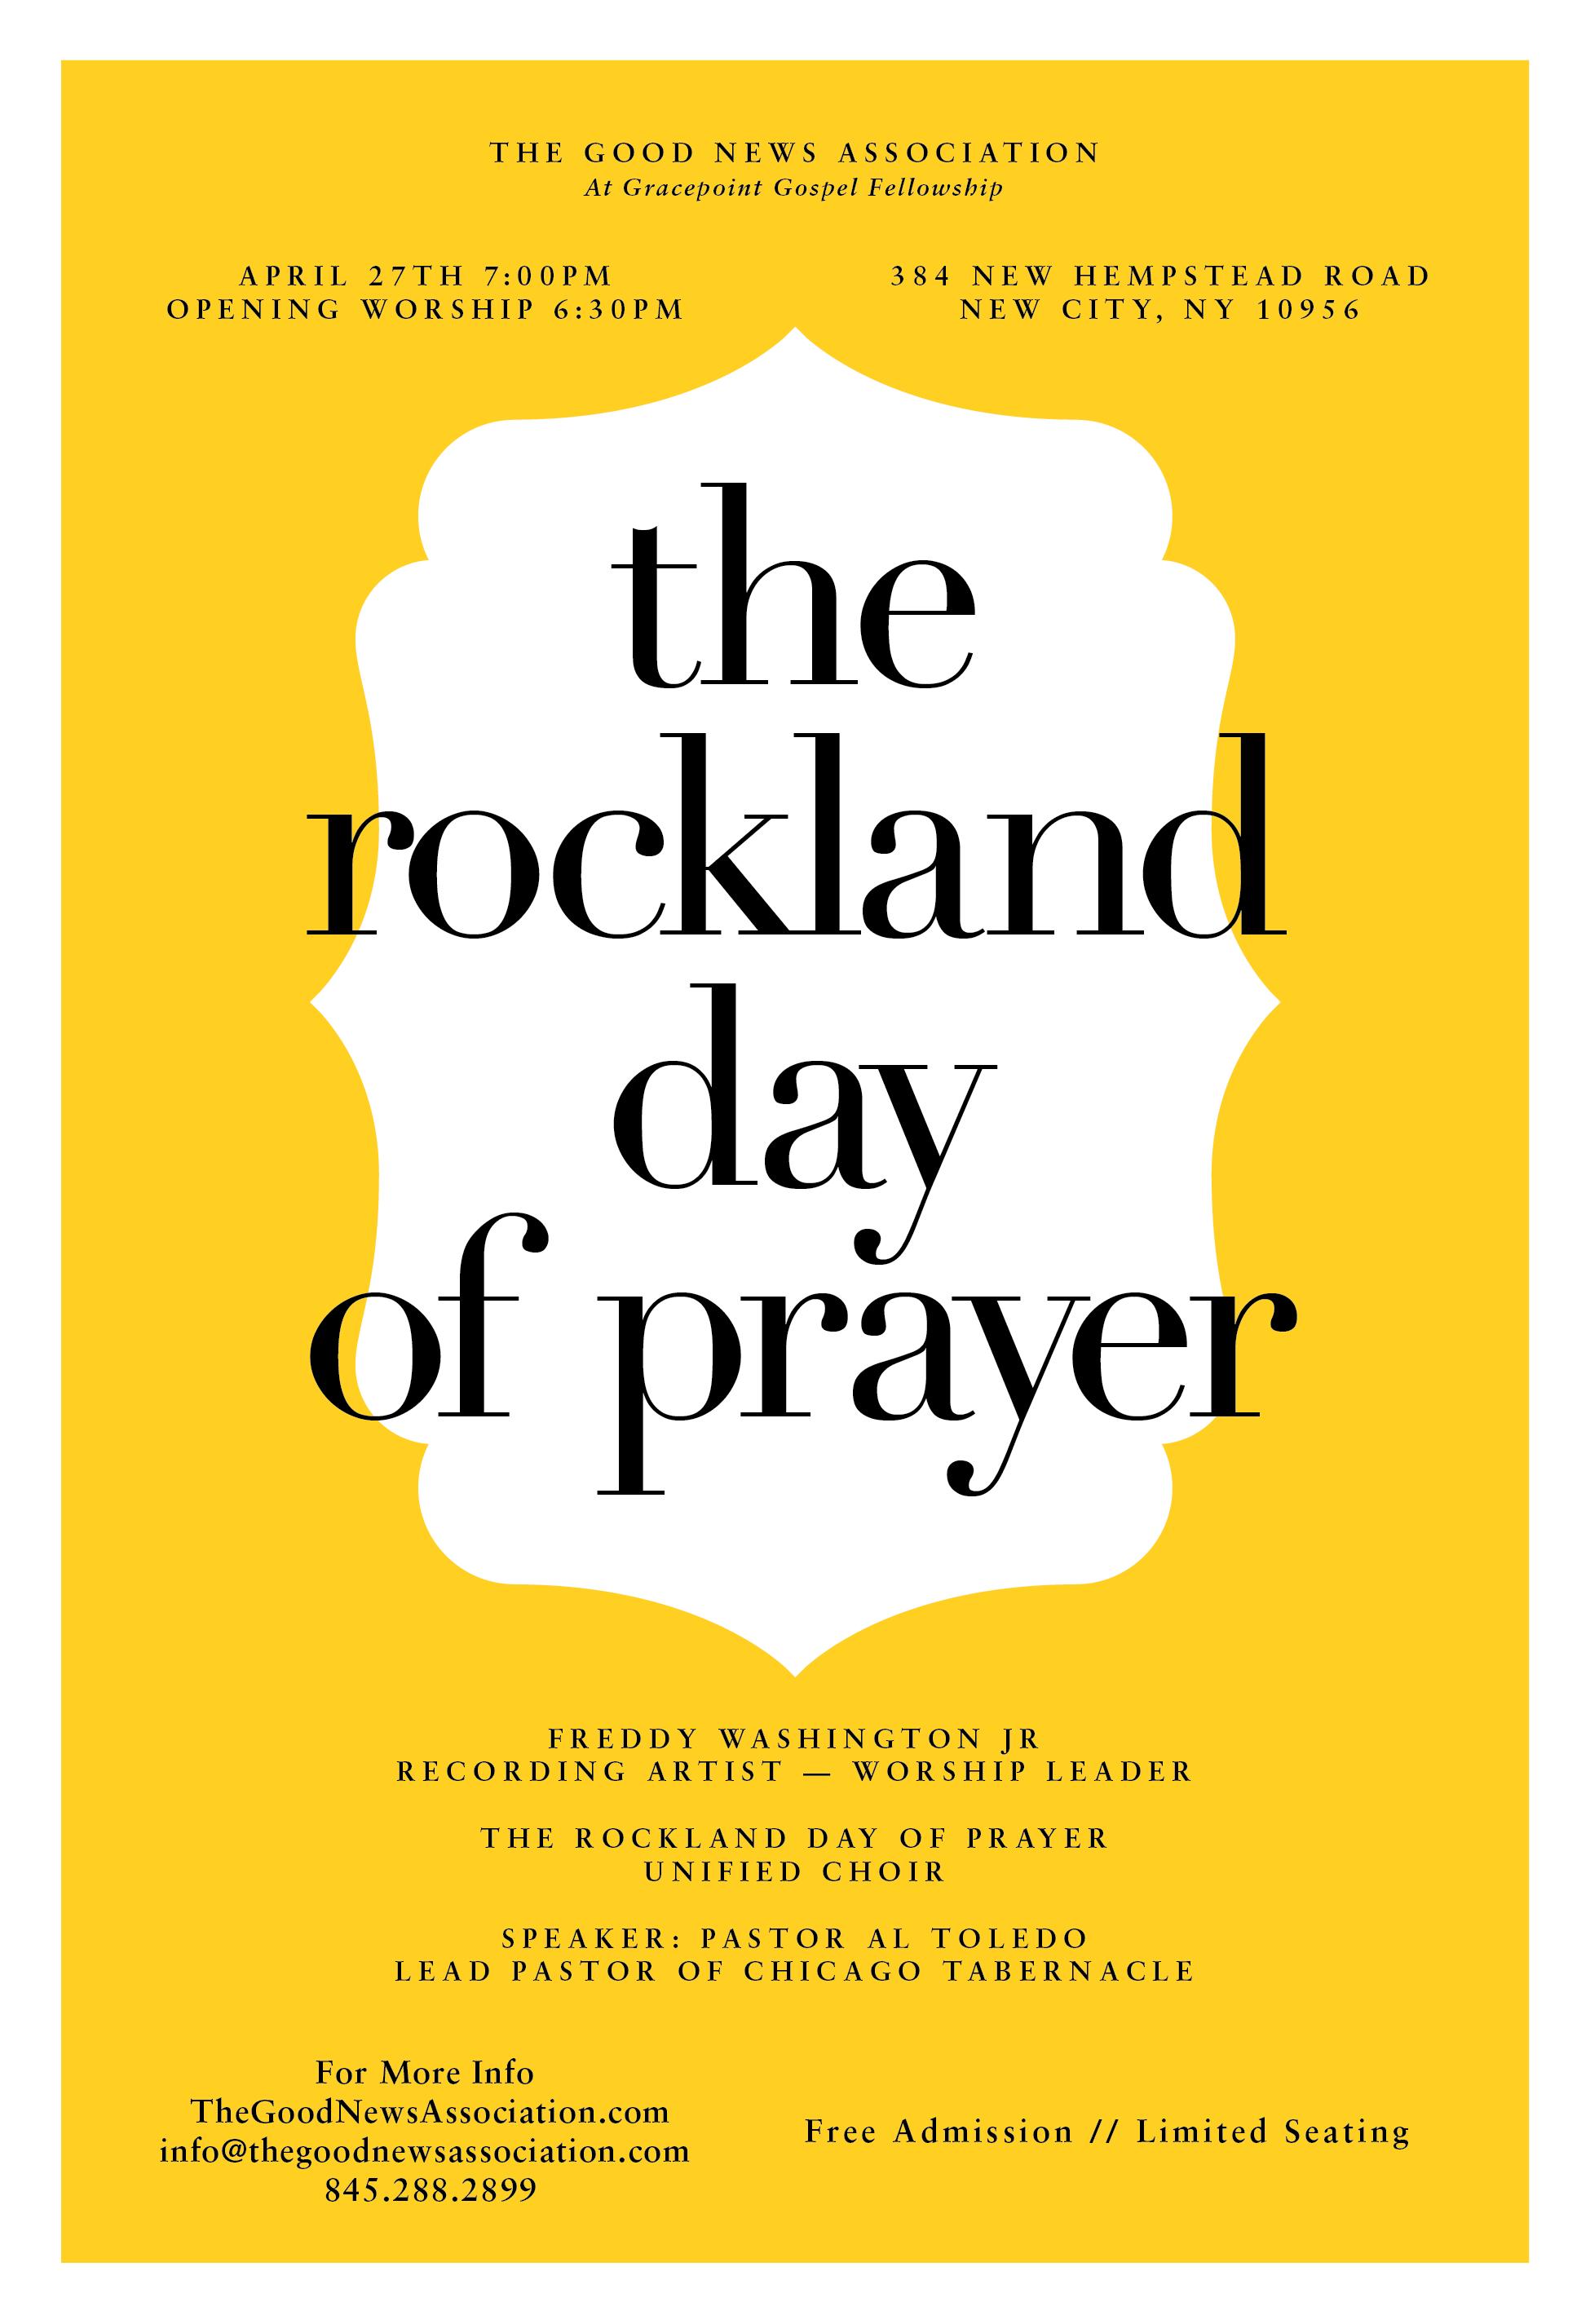 RocklandDayOfPrayer_2017_02-01.png